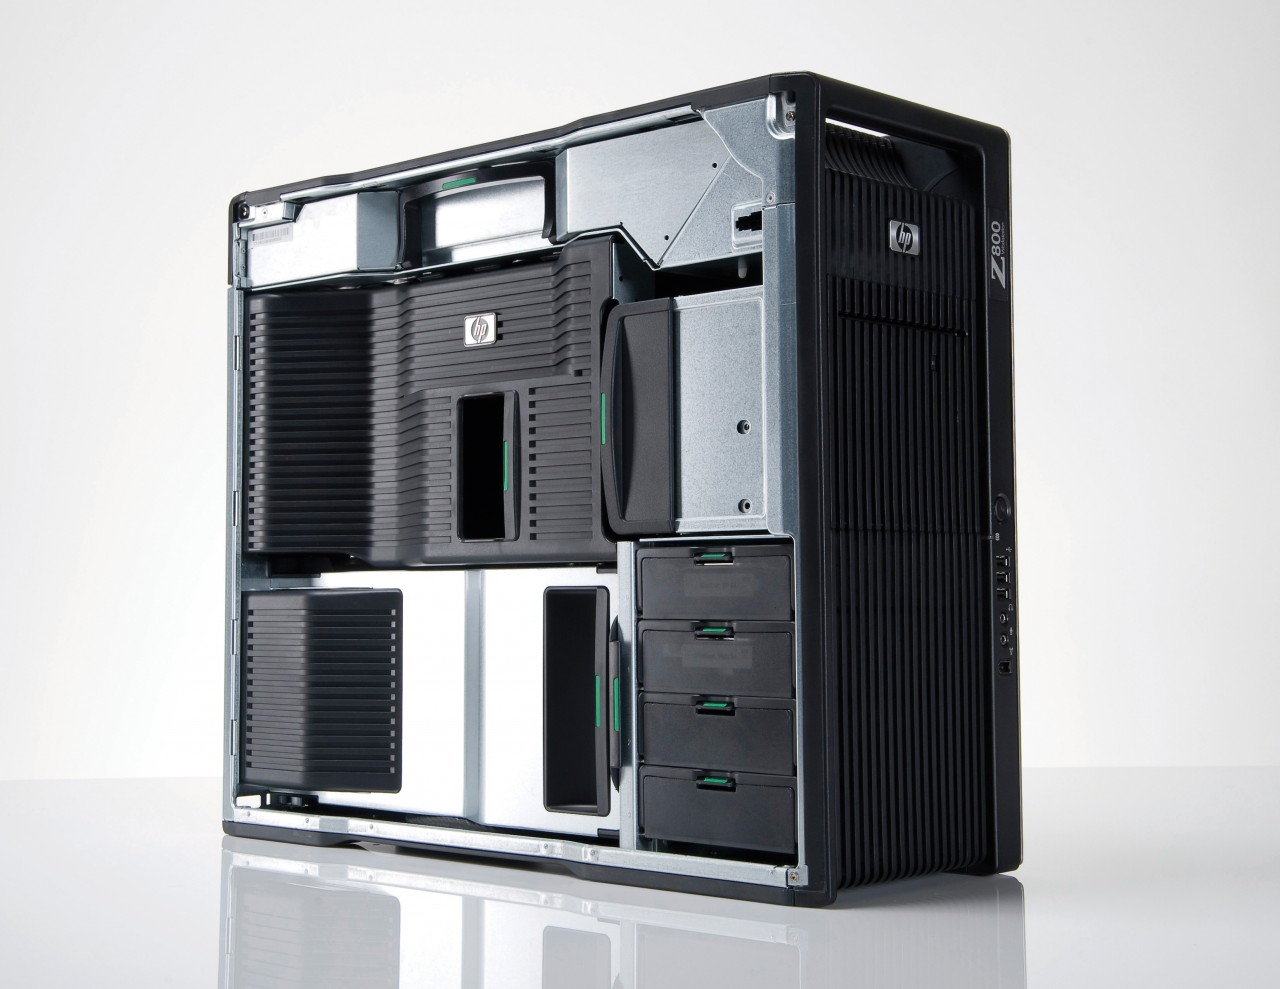 HP Z800 Workstation - Dual Xeon E5650 8GB 500GB NVIDIA Quadro FX 5600 Dual  LAN